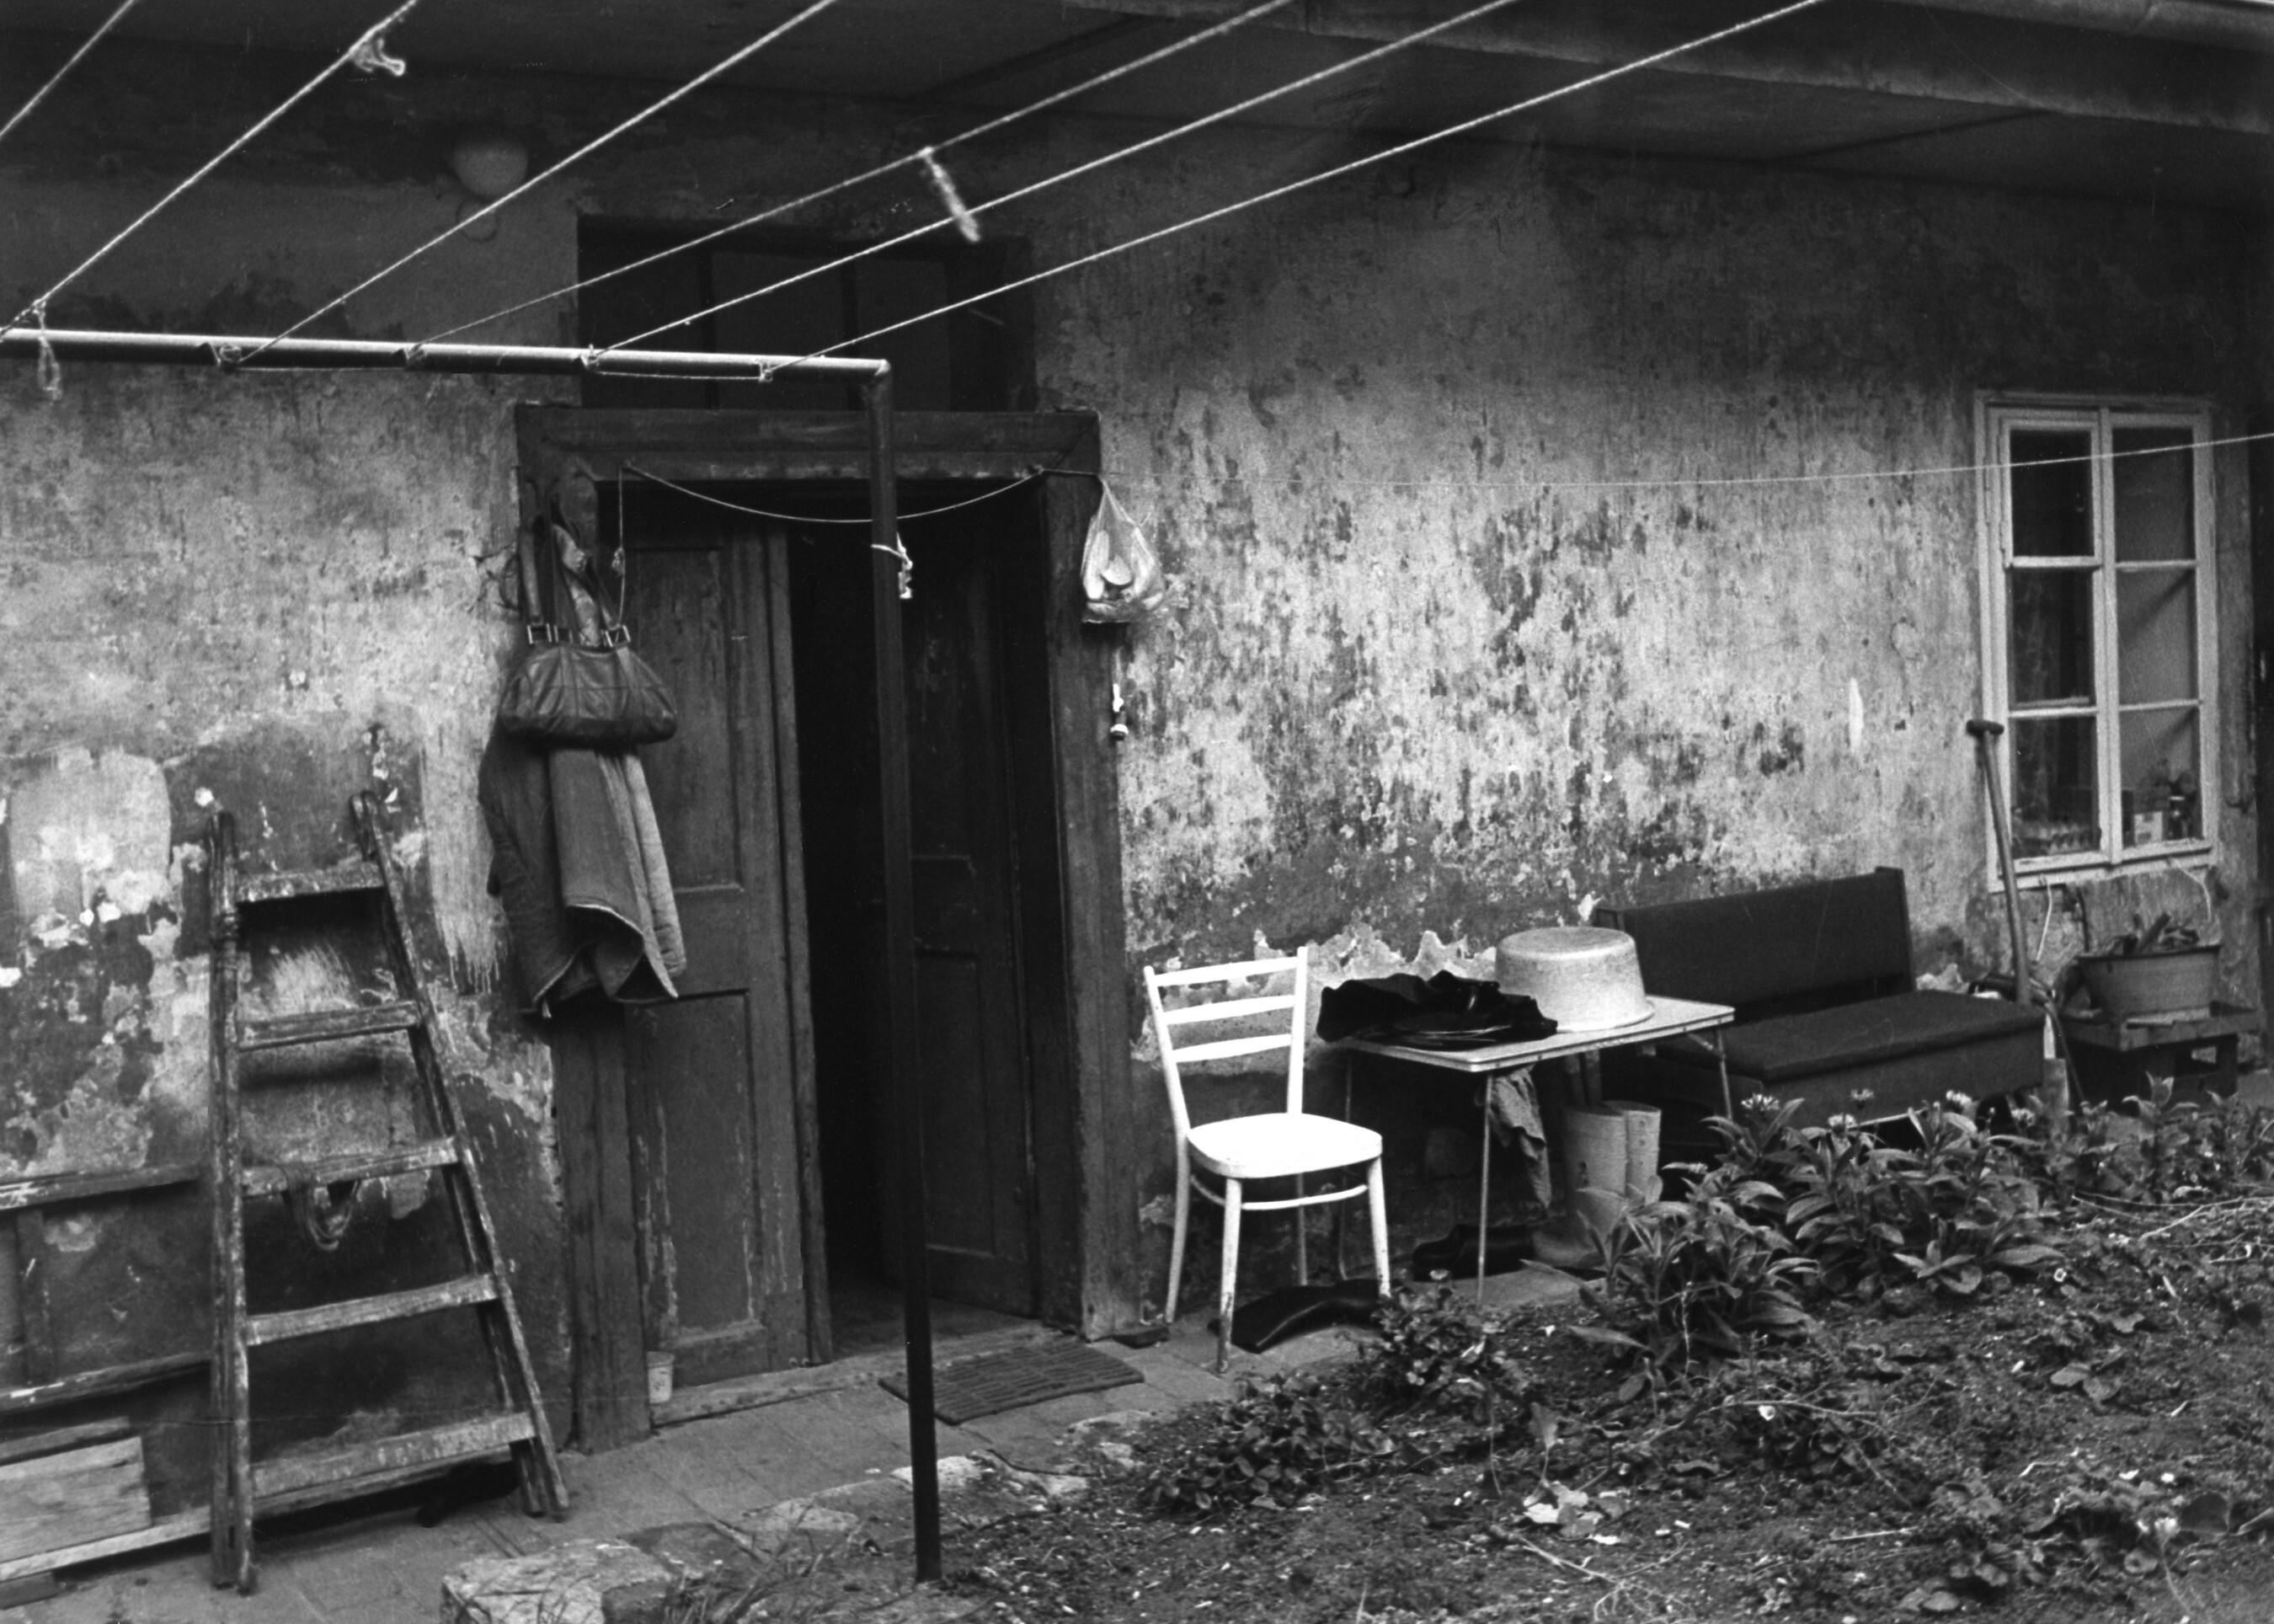 Вршовице, 1965 – 1989. Фотограф Франтишек Досталь